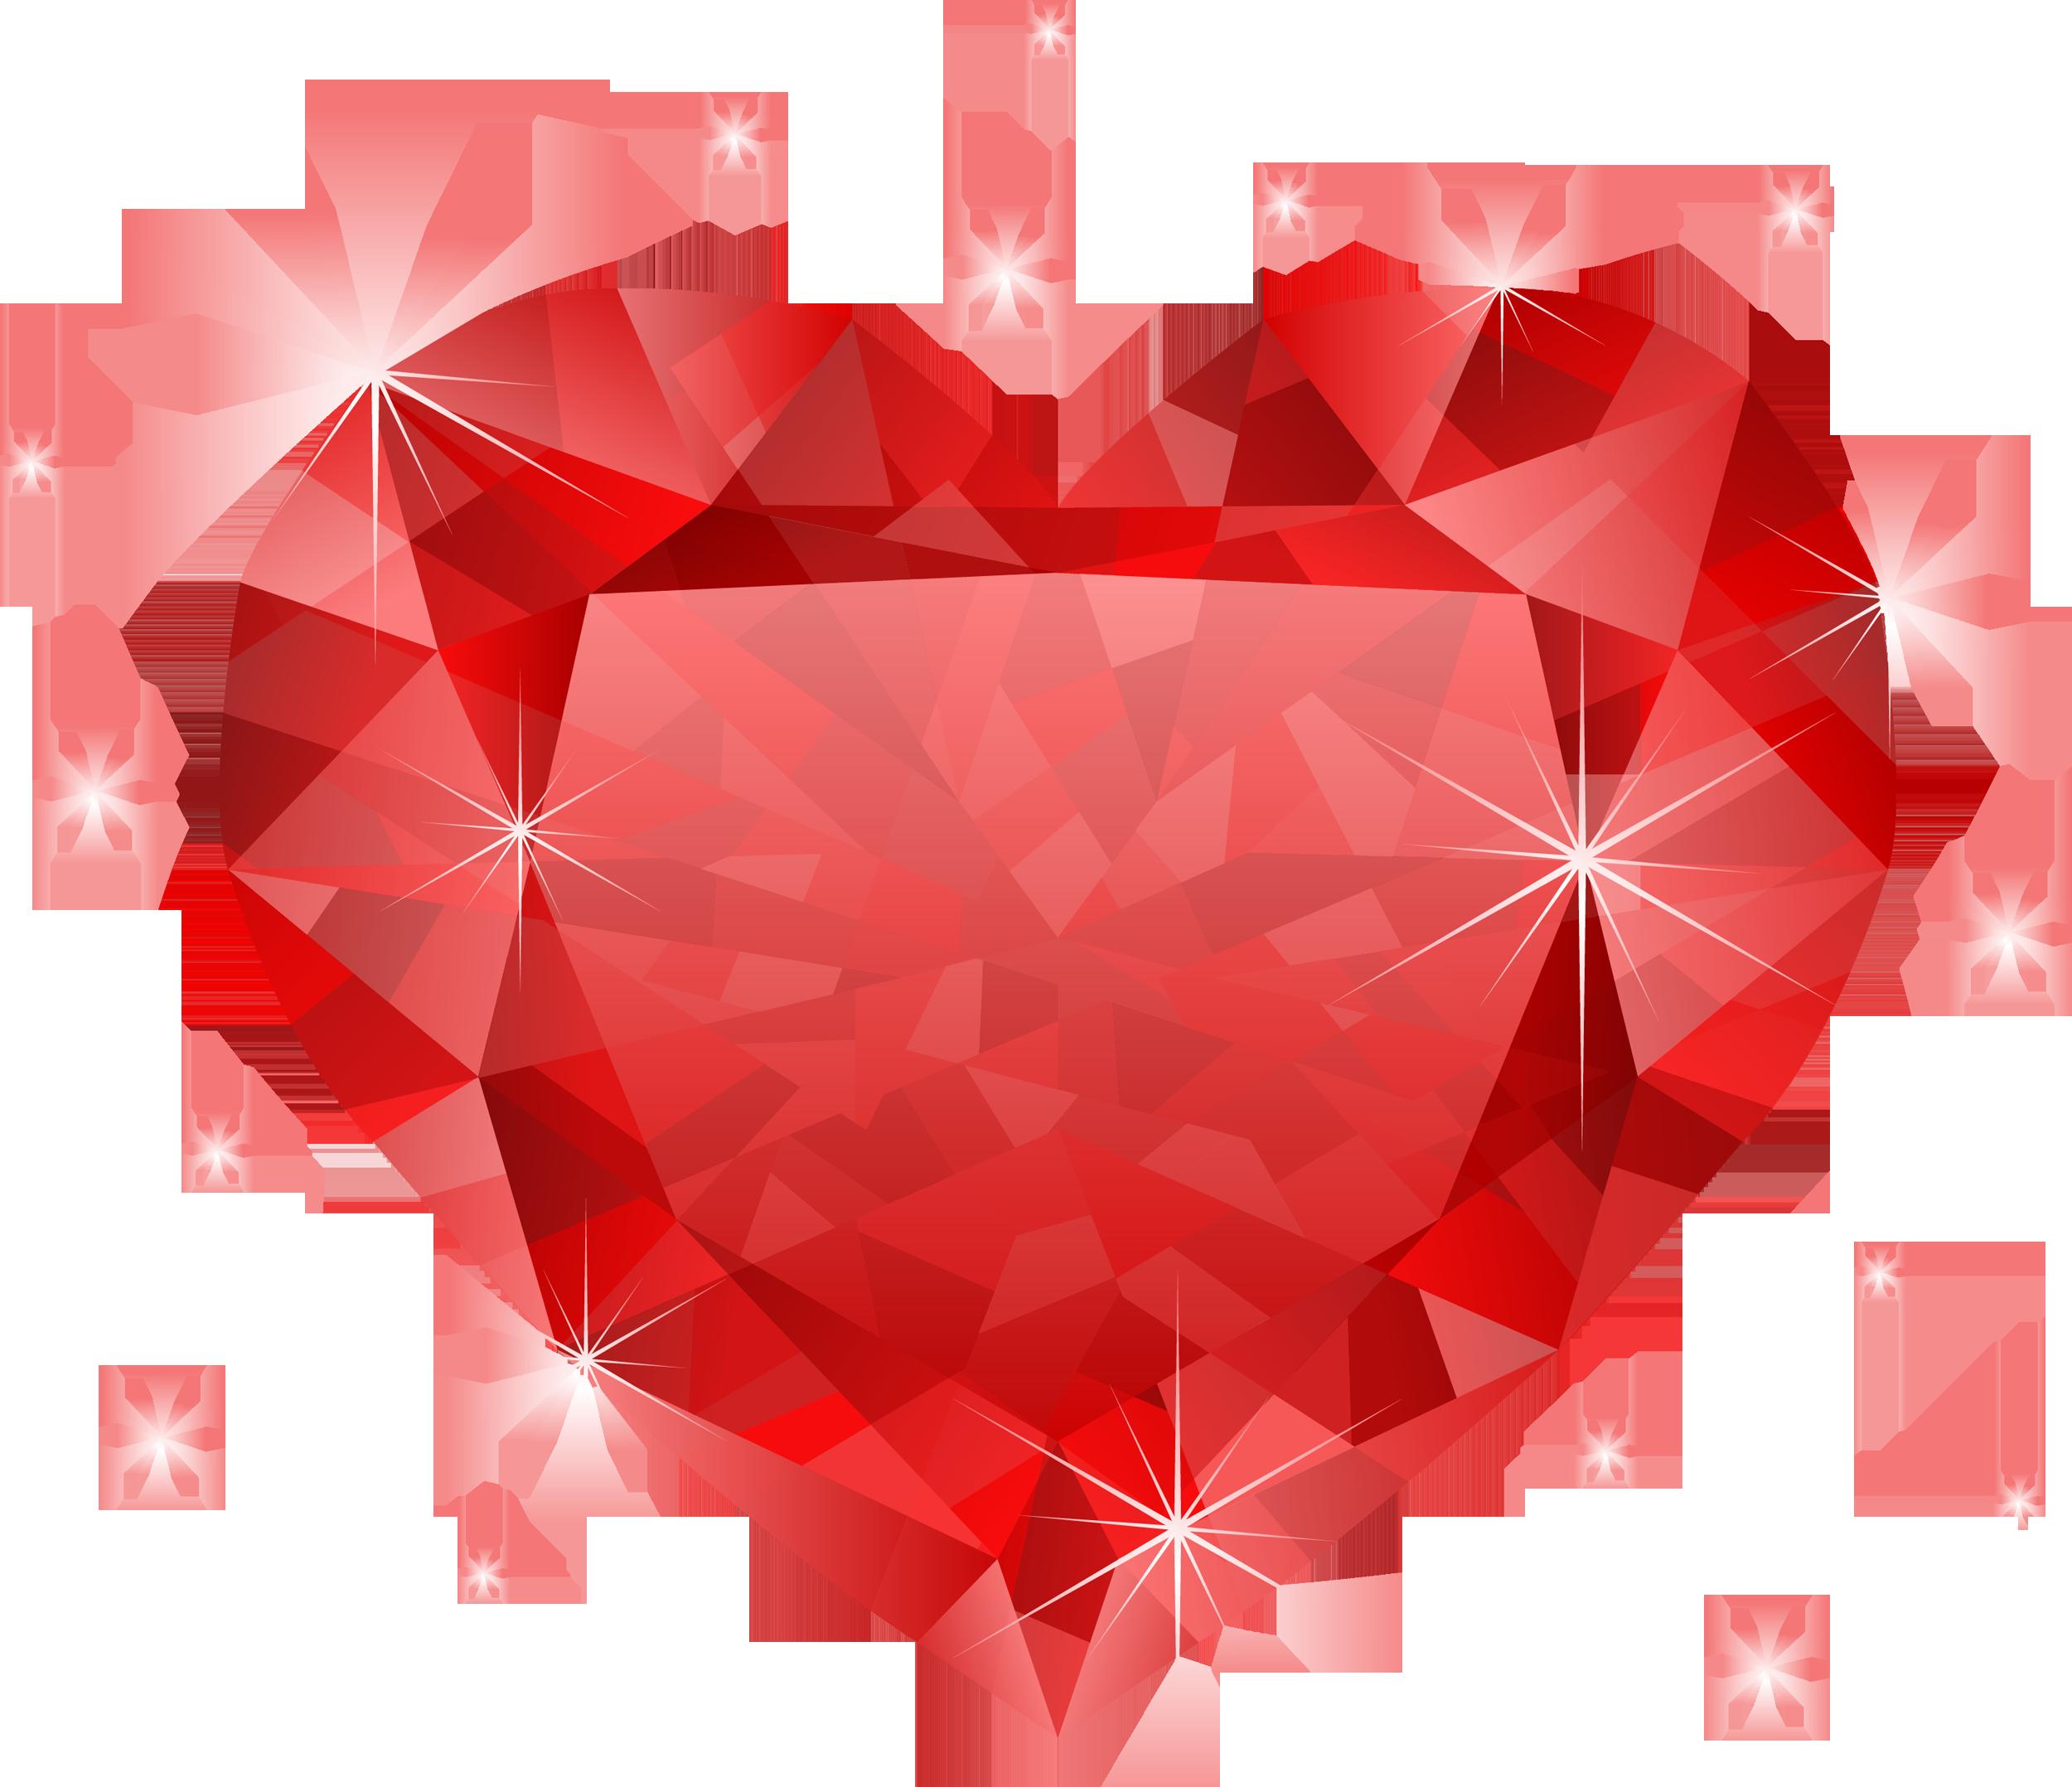 jpg transparent Large transparent diamond red. Lifestyle clipart healthy heart.